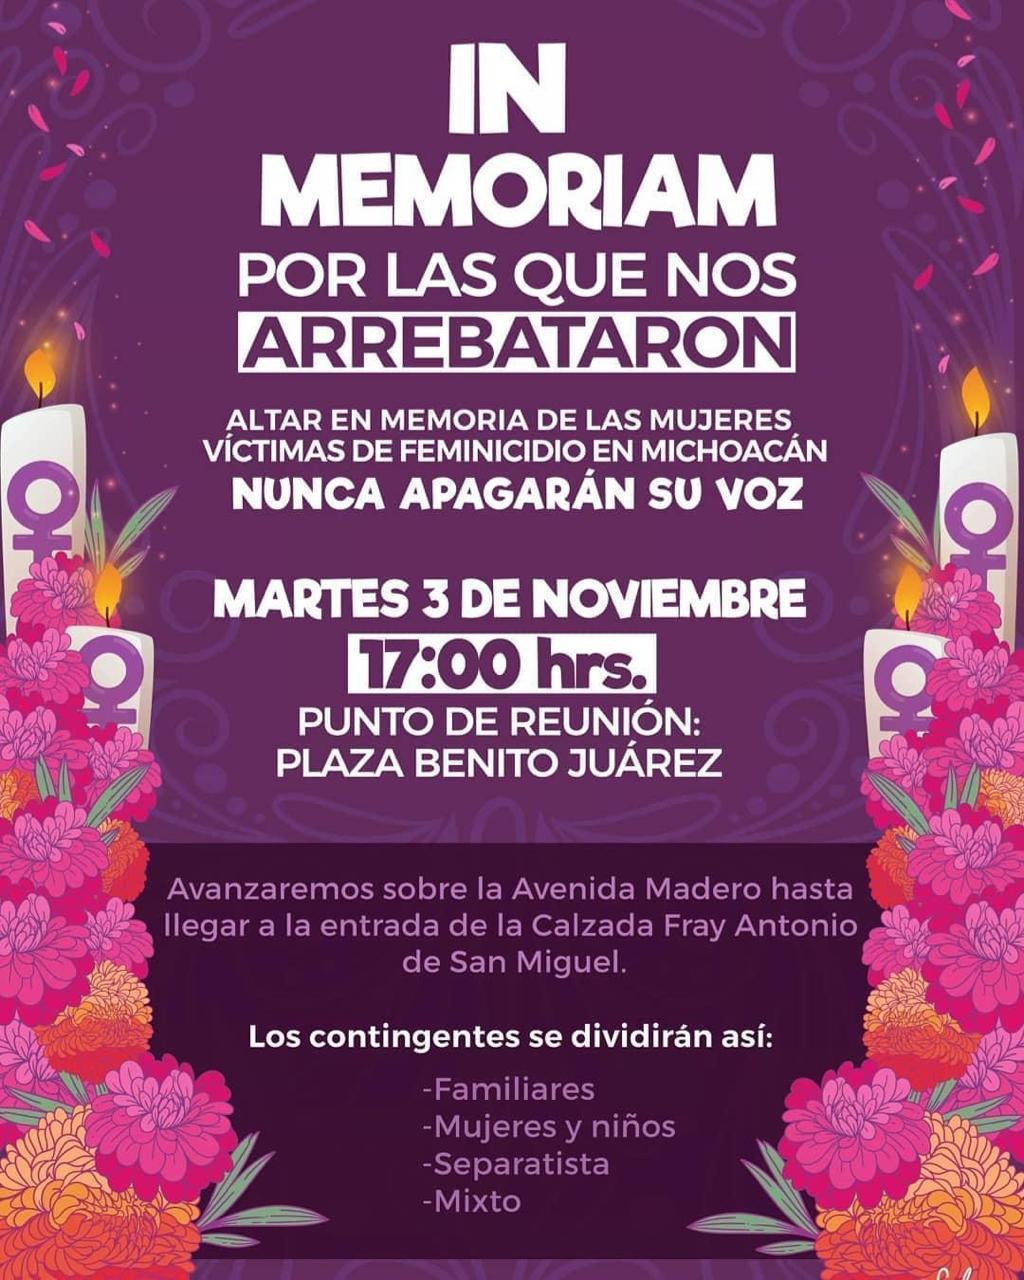 Marcharán en memoria de víctimas de feminicidio (Michoacán)